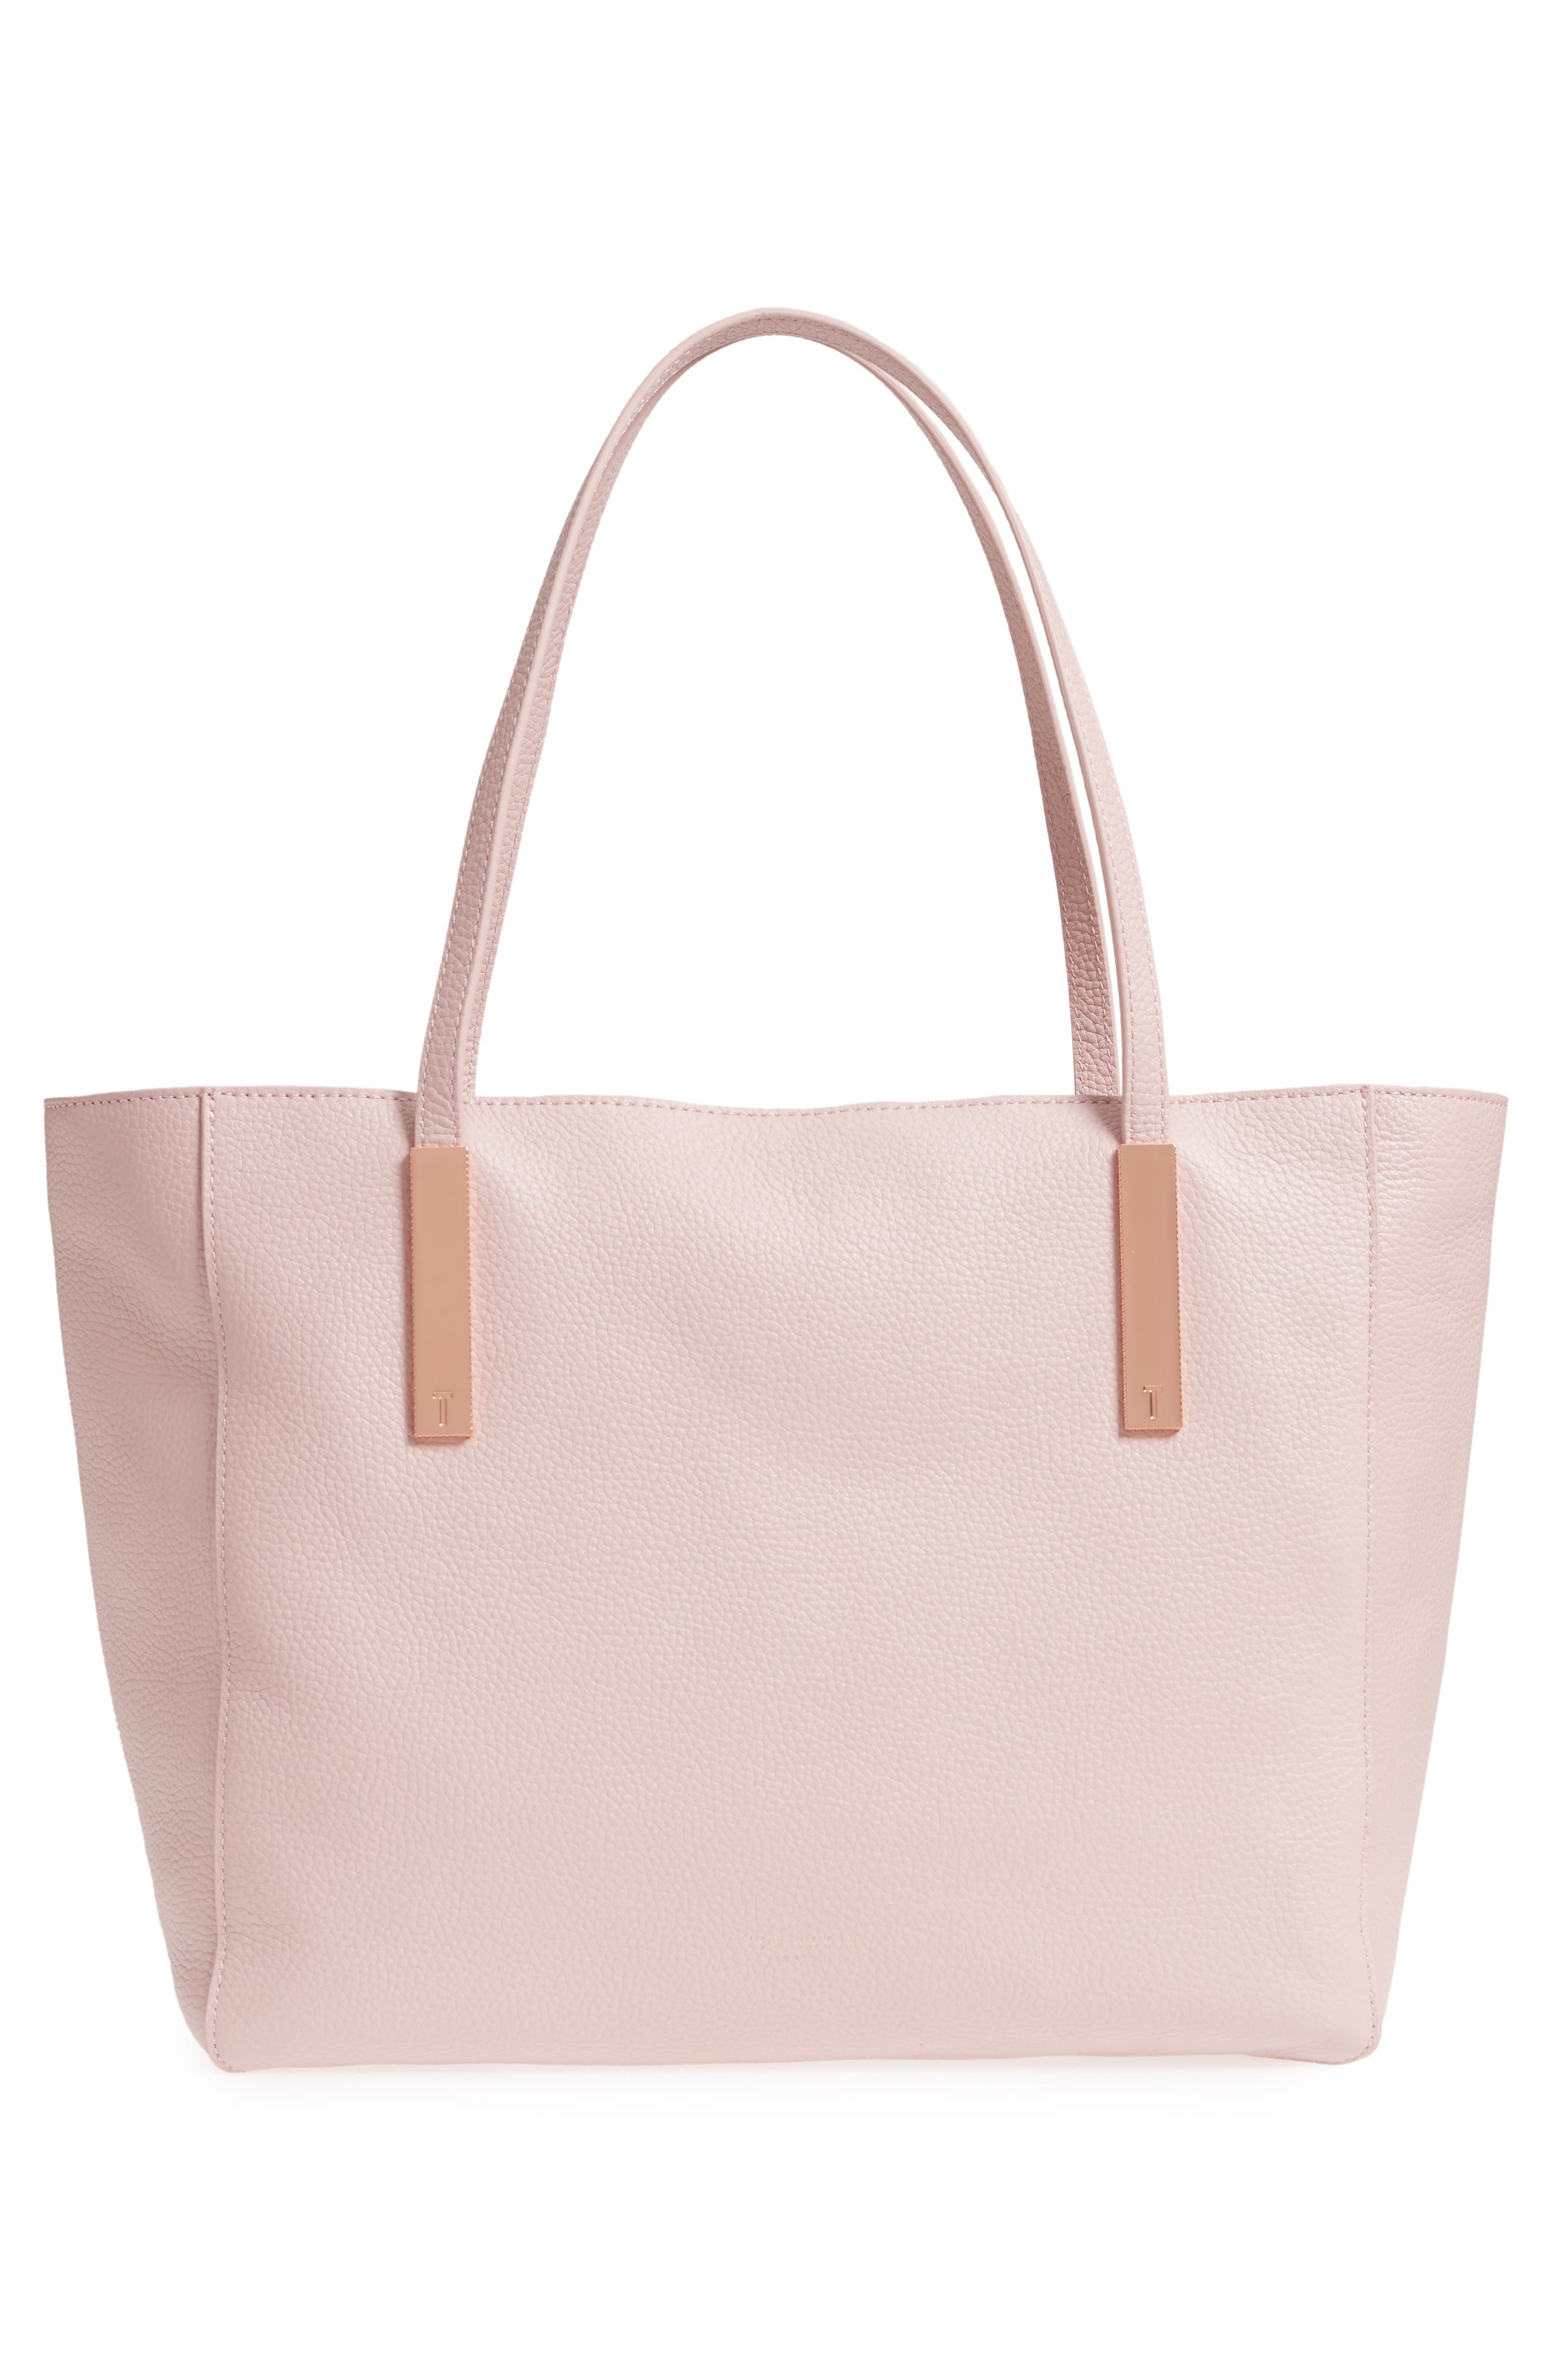 Soft Blossom Leather Shopper,                             Alternate thumbnail 3, color,                             Light Pink